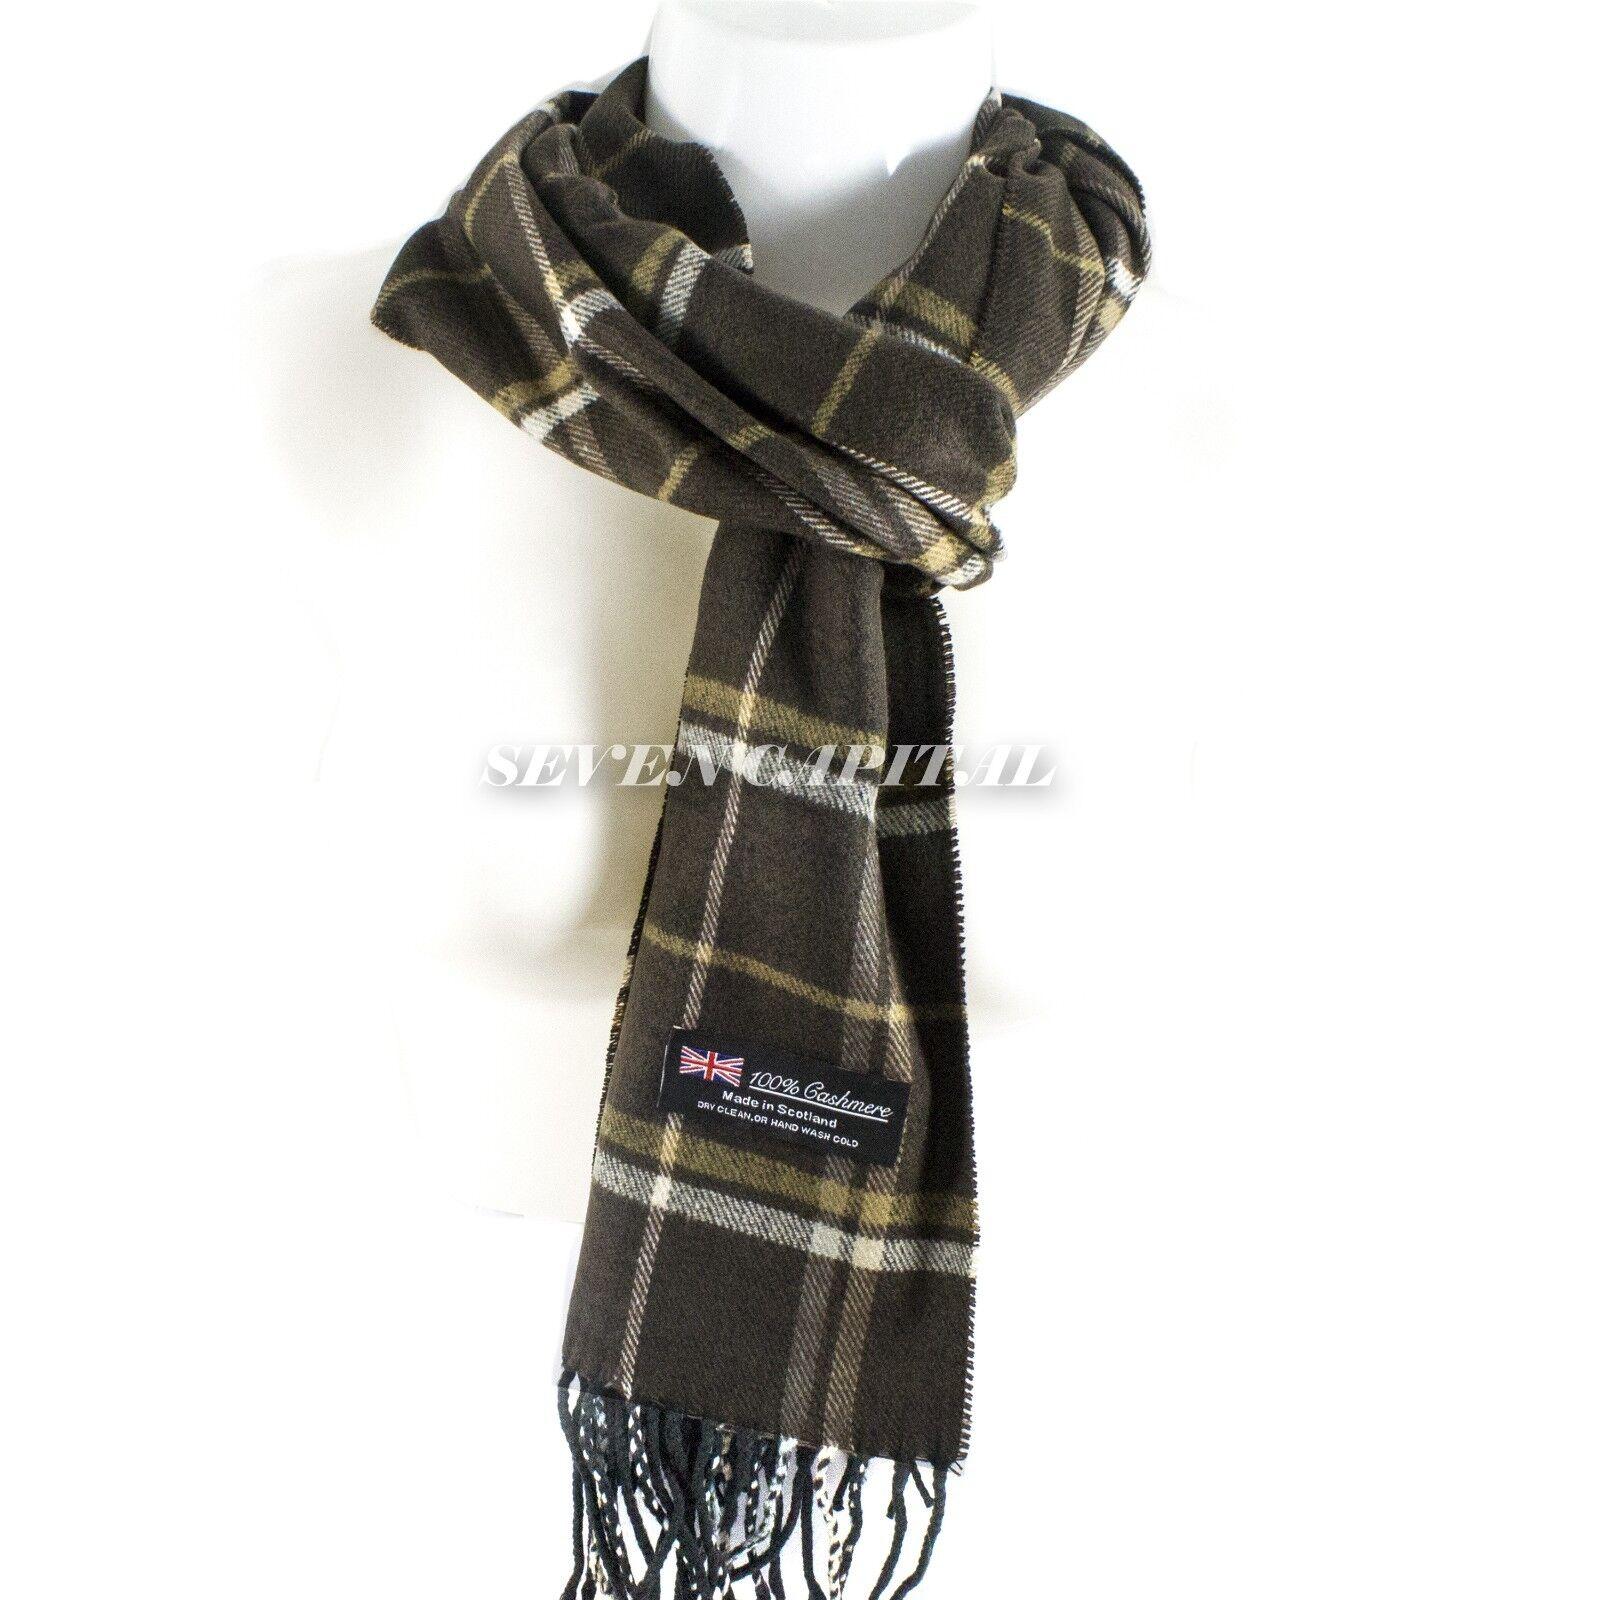 Mens Womens Winter Warm SCOTLAND Made 100% CASHMERE Scarf Scarves Plaid Wool 9. Plaid: Dark Brown/Yellow